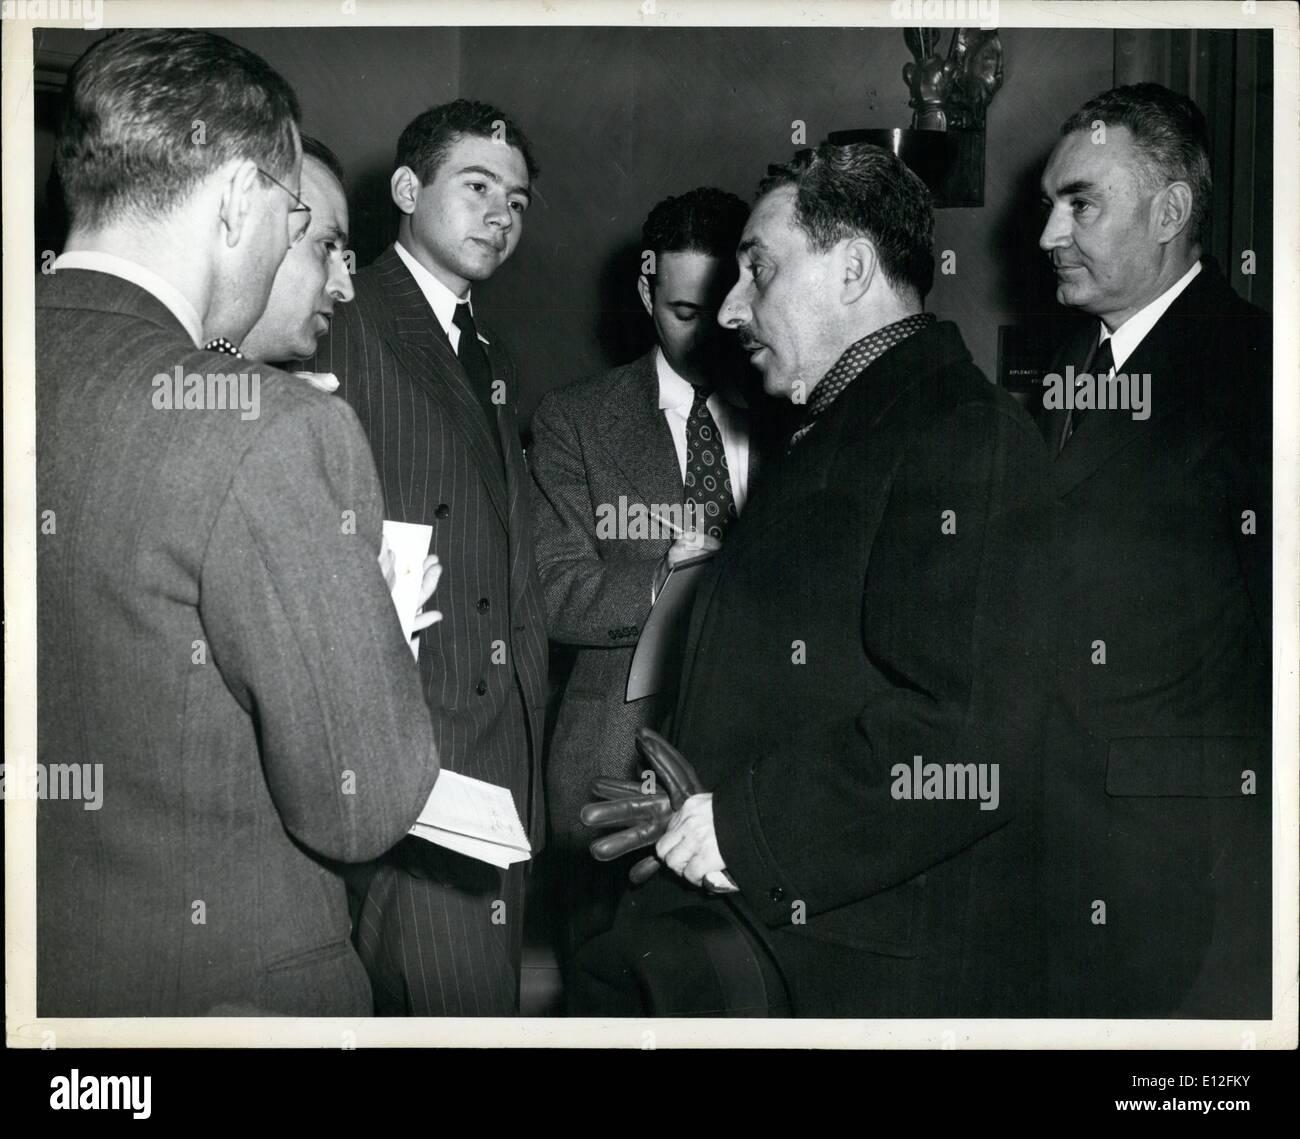 09 janvier 2012 - Sharett Affaires Sec d'Israël. Photo Stock